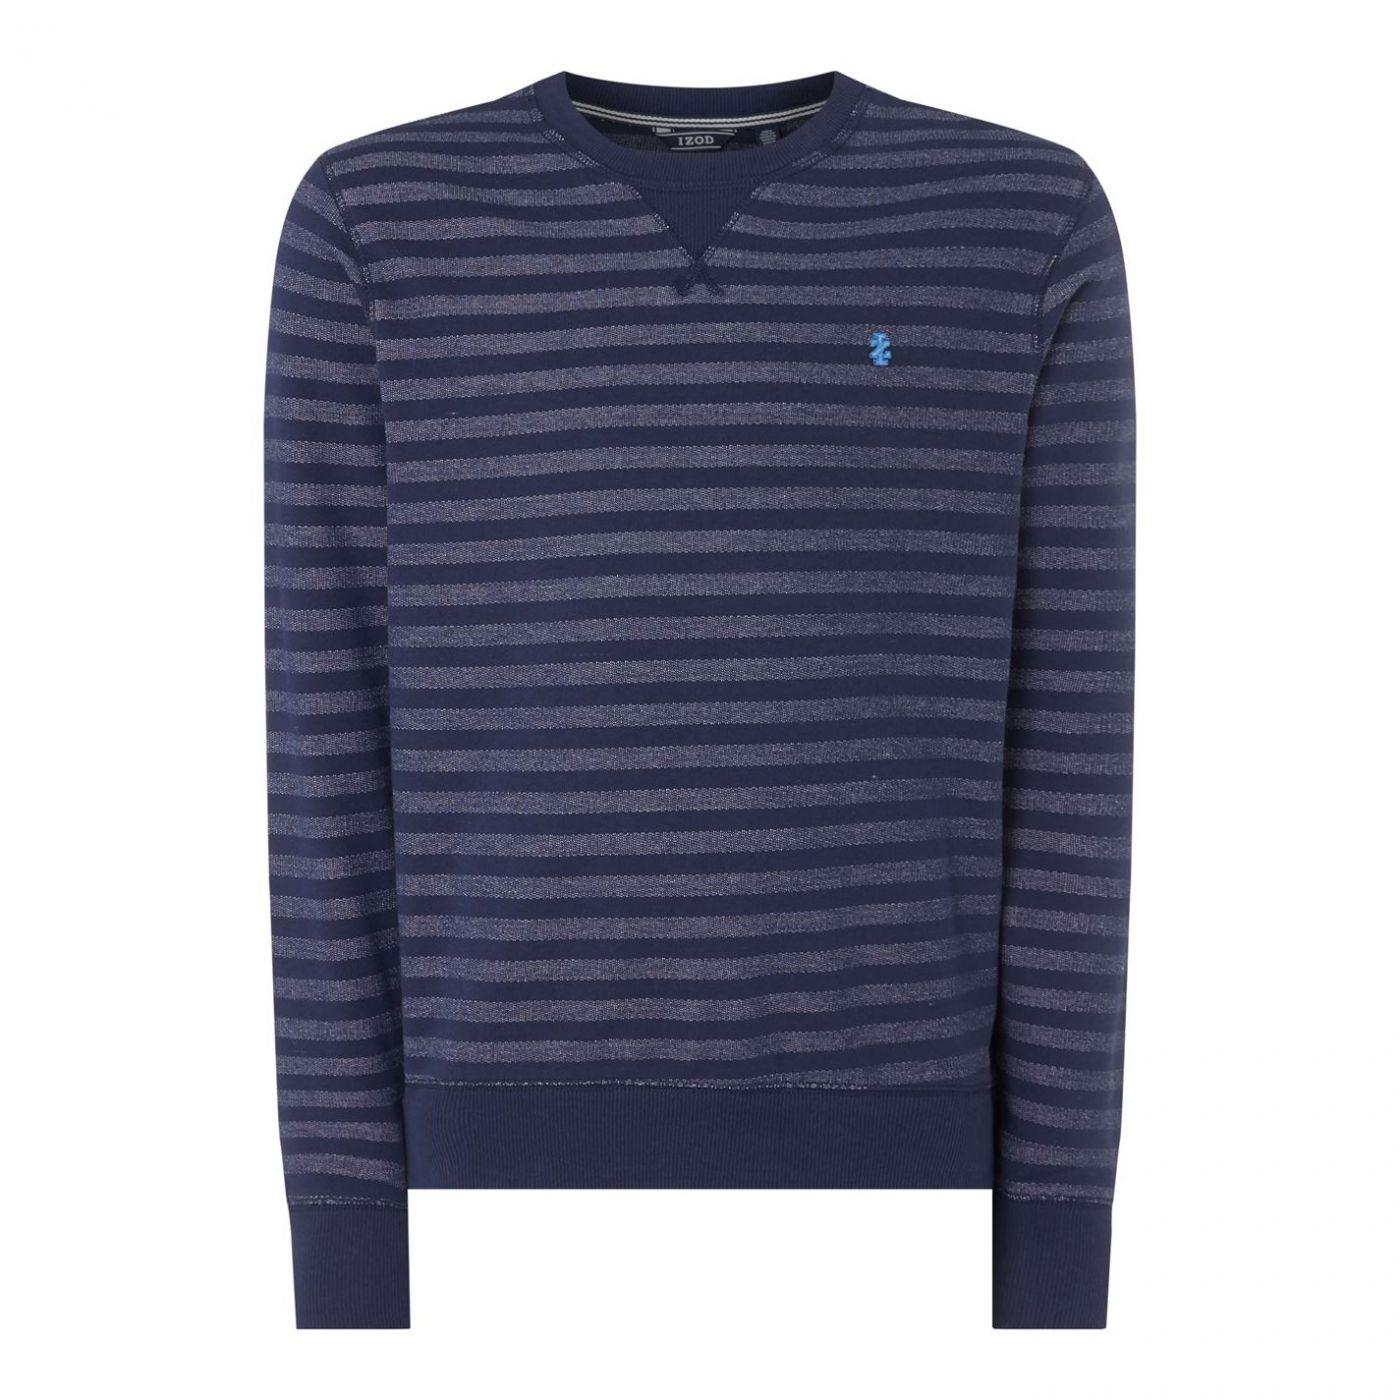 IZOD Striped Crew Neck Sweater